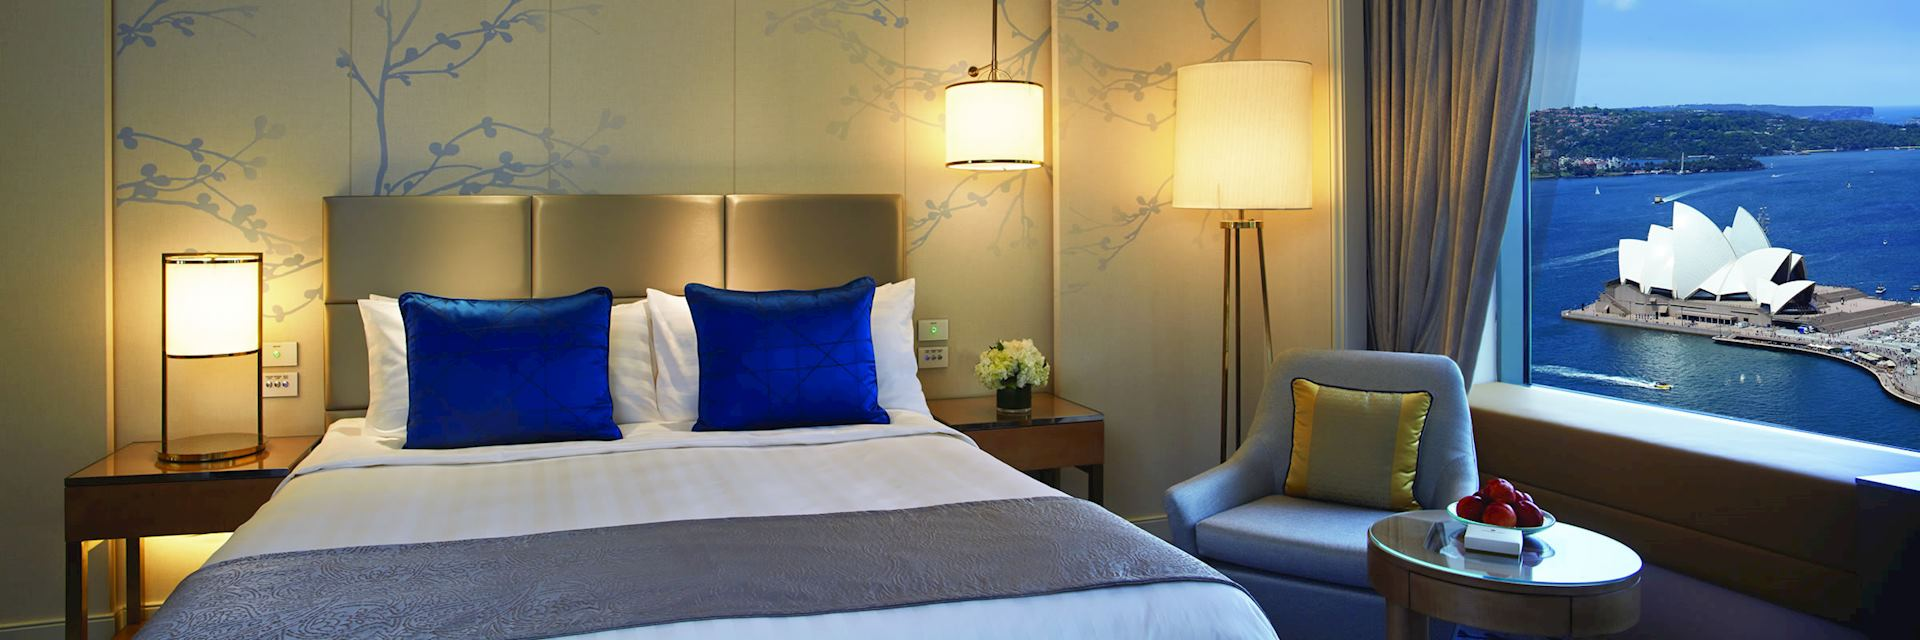 Horizon Club Room, Shangri-La Hotel, Sydney